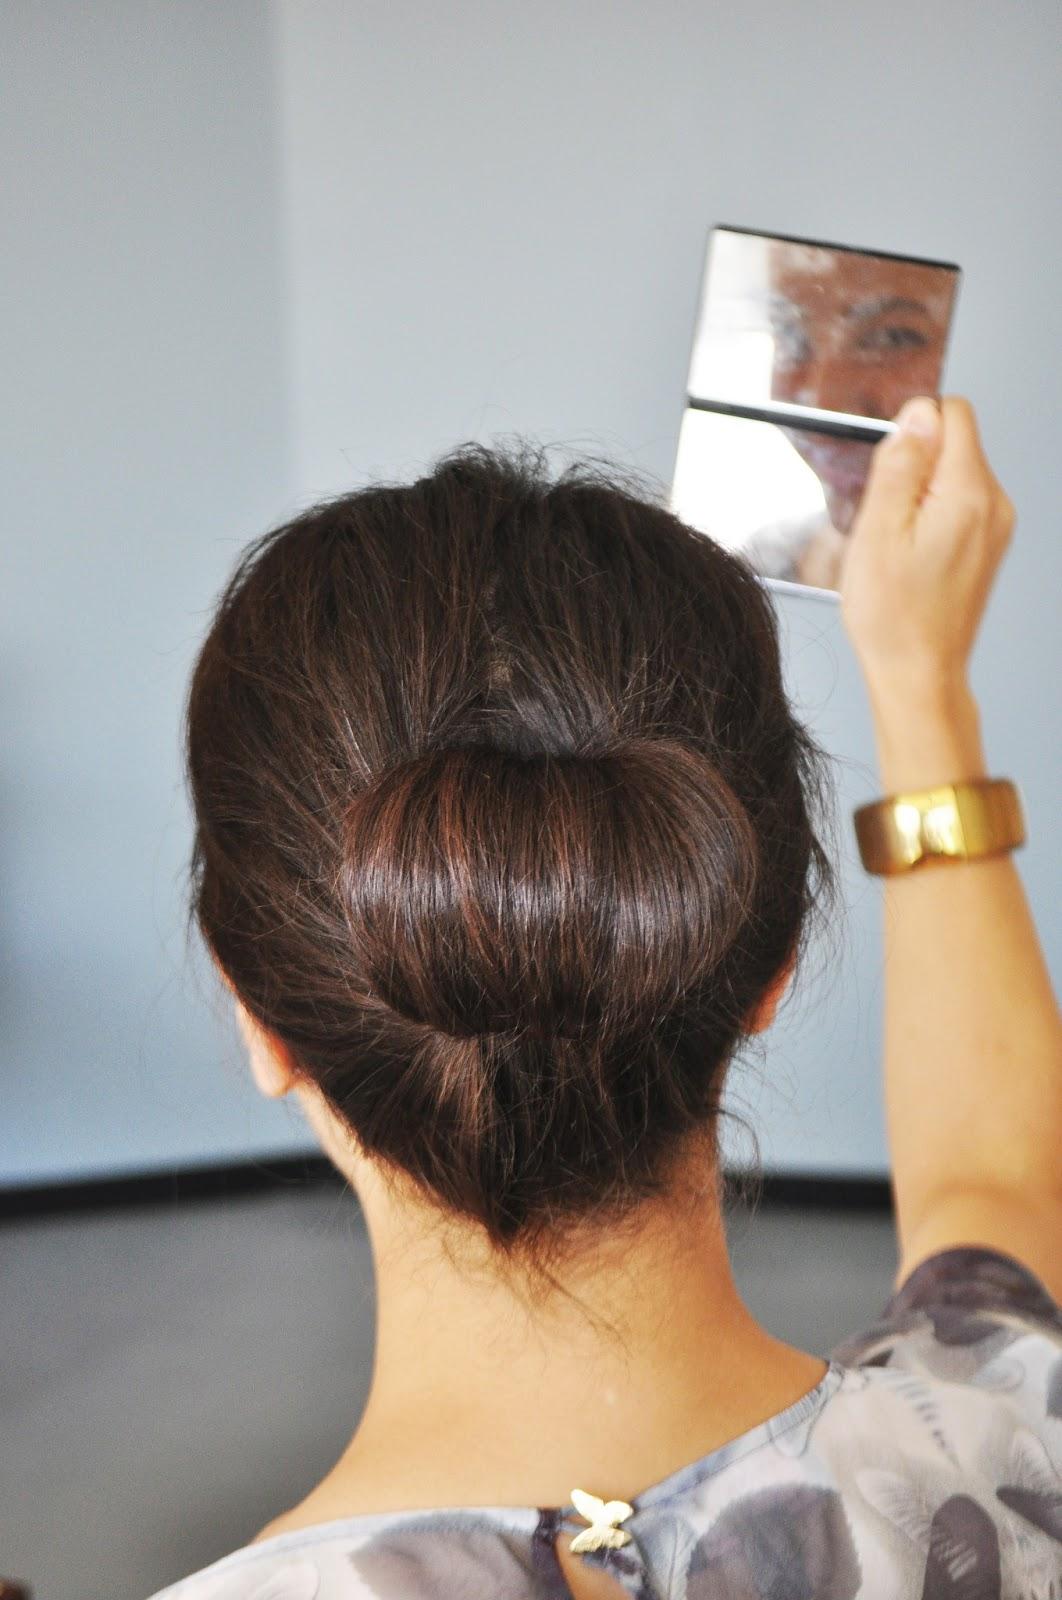 How to chestnut a style bun photo